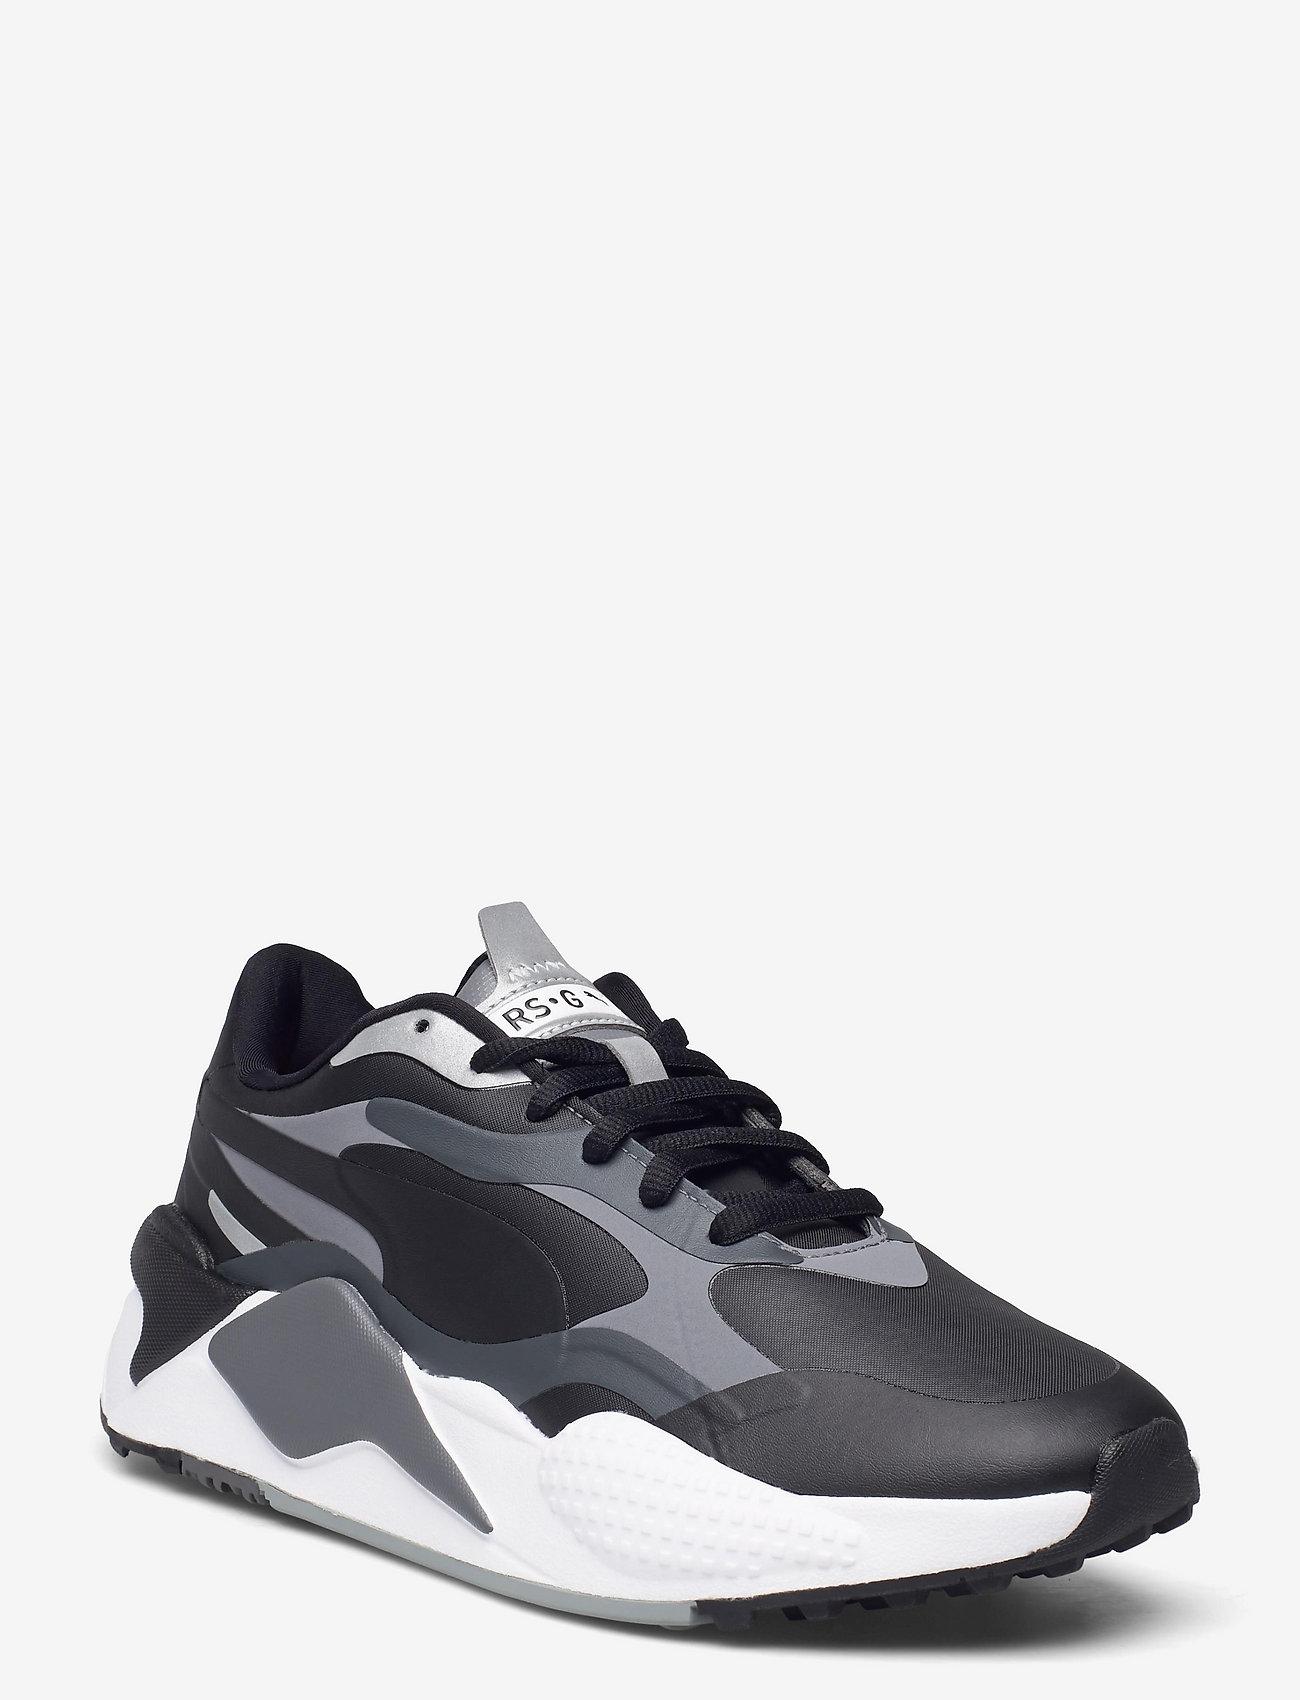 PUMA Golf - RS-G - golf shoes - puma black-quiet shade-dark shadow - 0